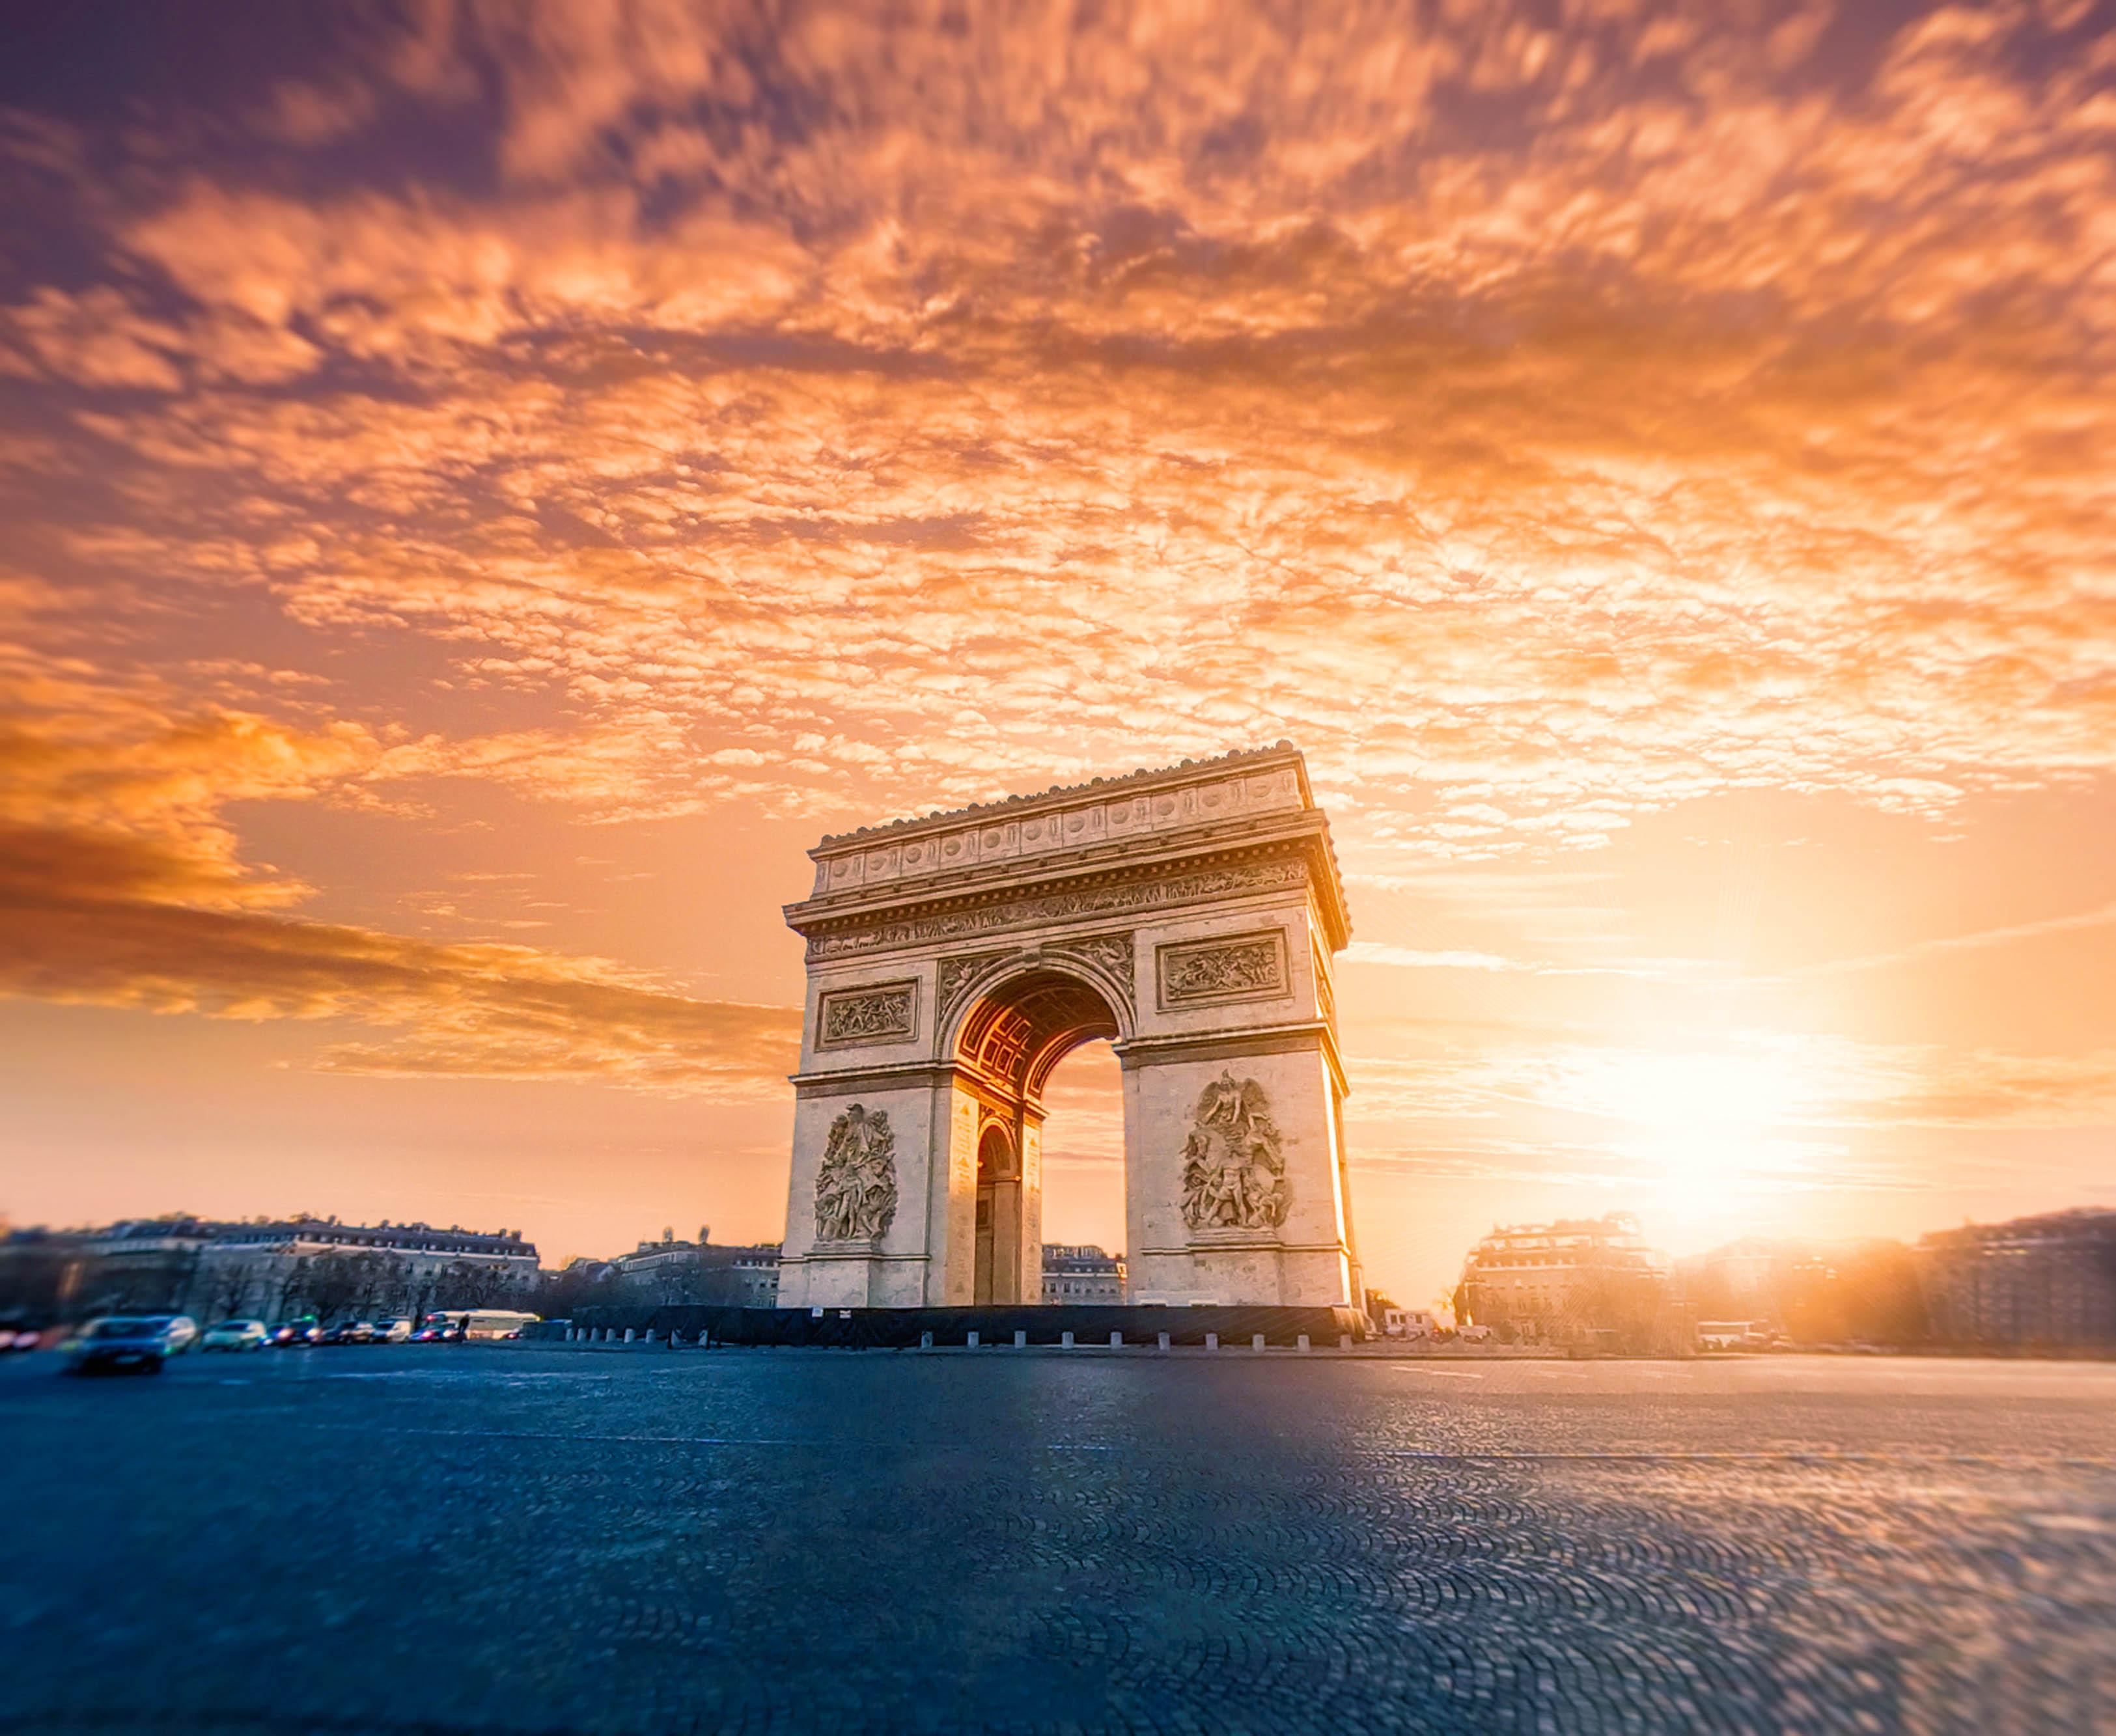 Франція Париж Тріумфальна арка